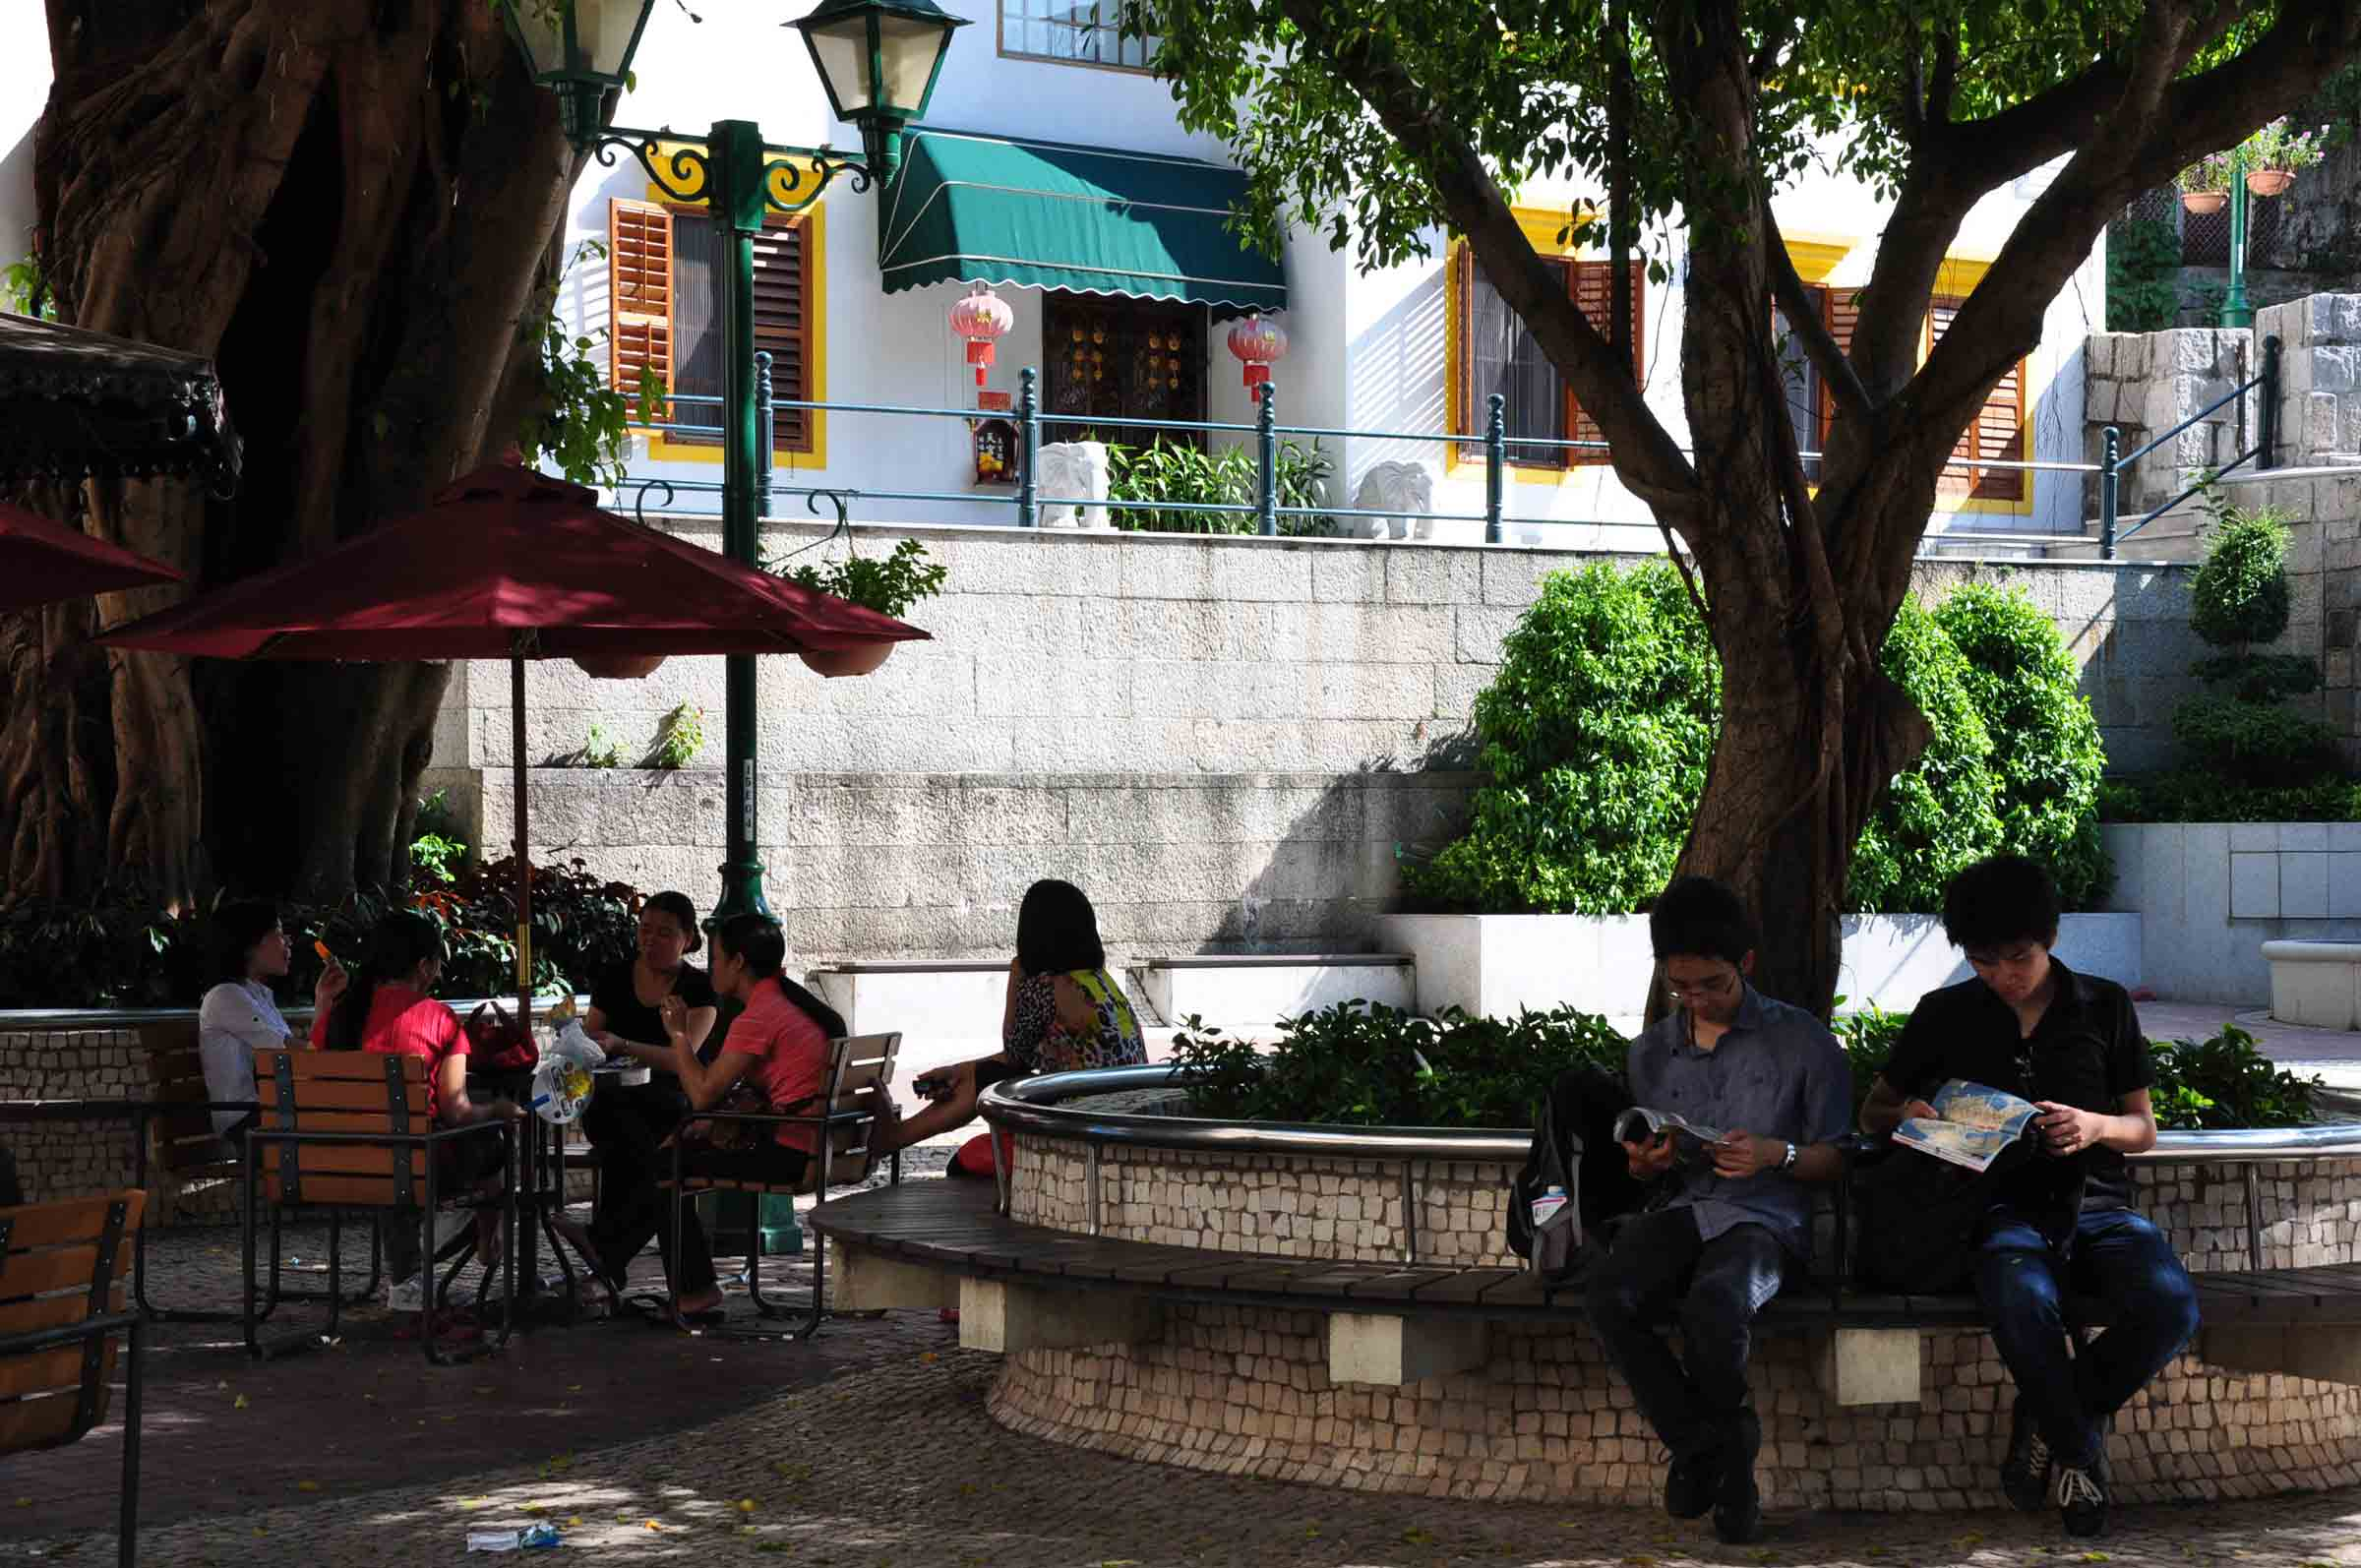 Macau world heritage site: Lilau square